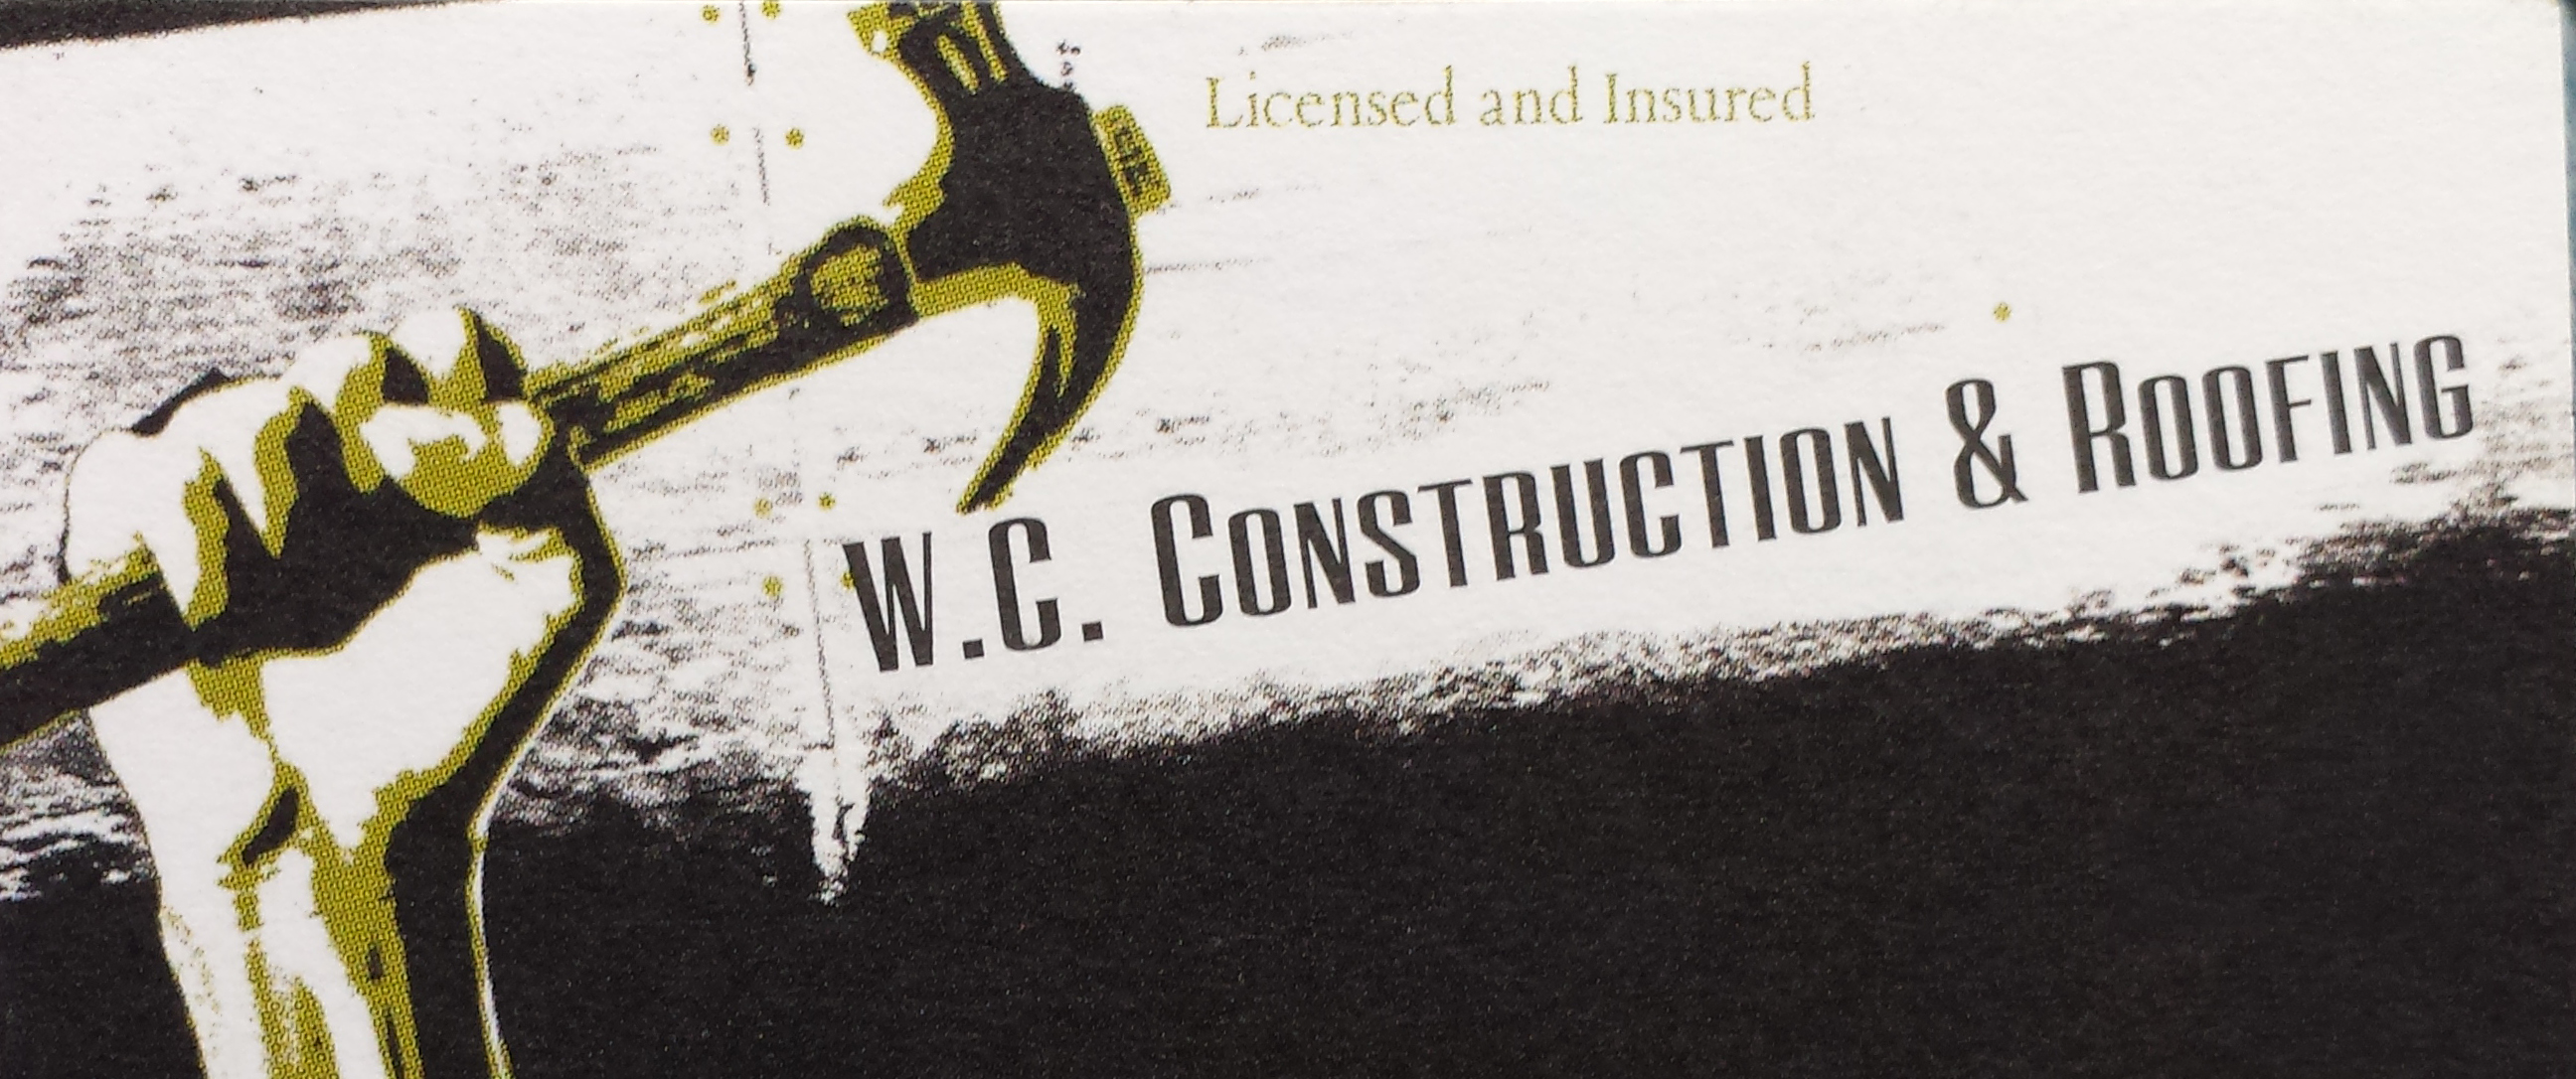 W.C. Construction